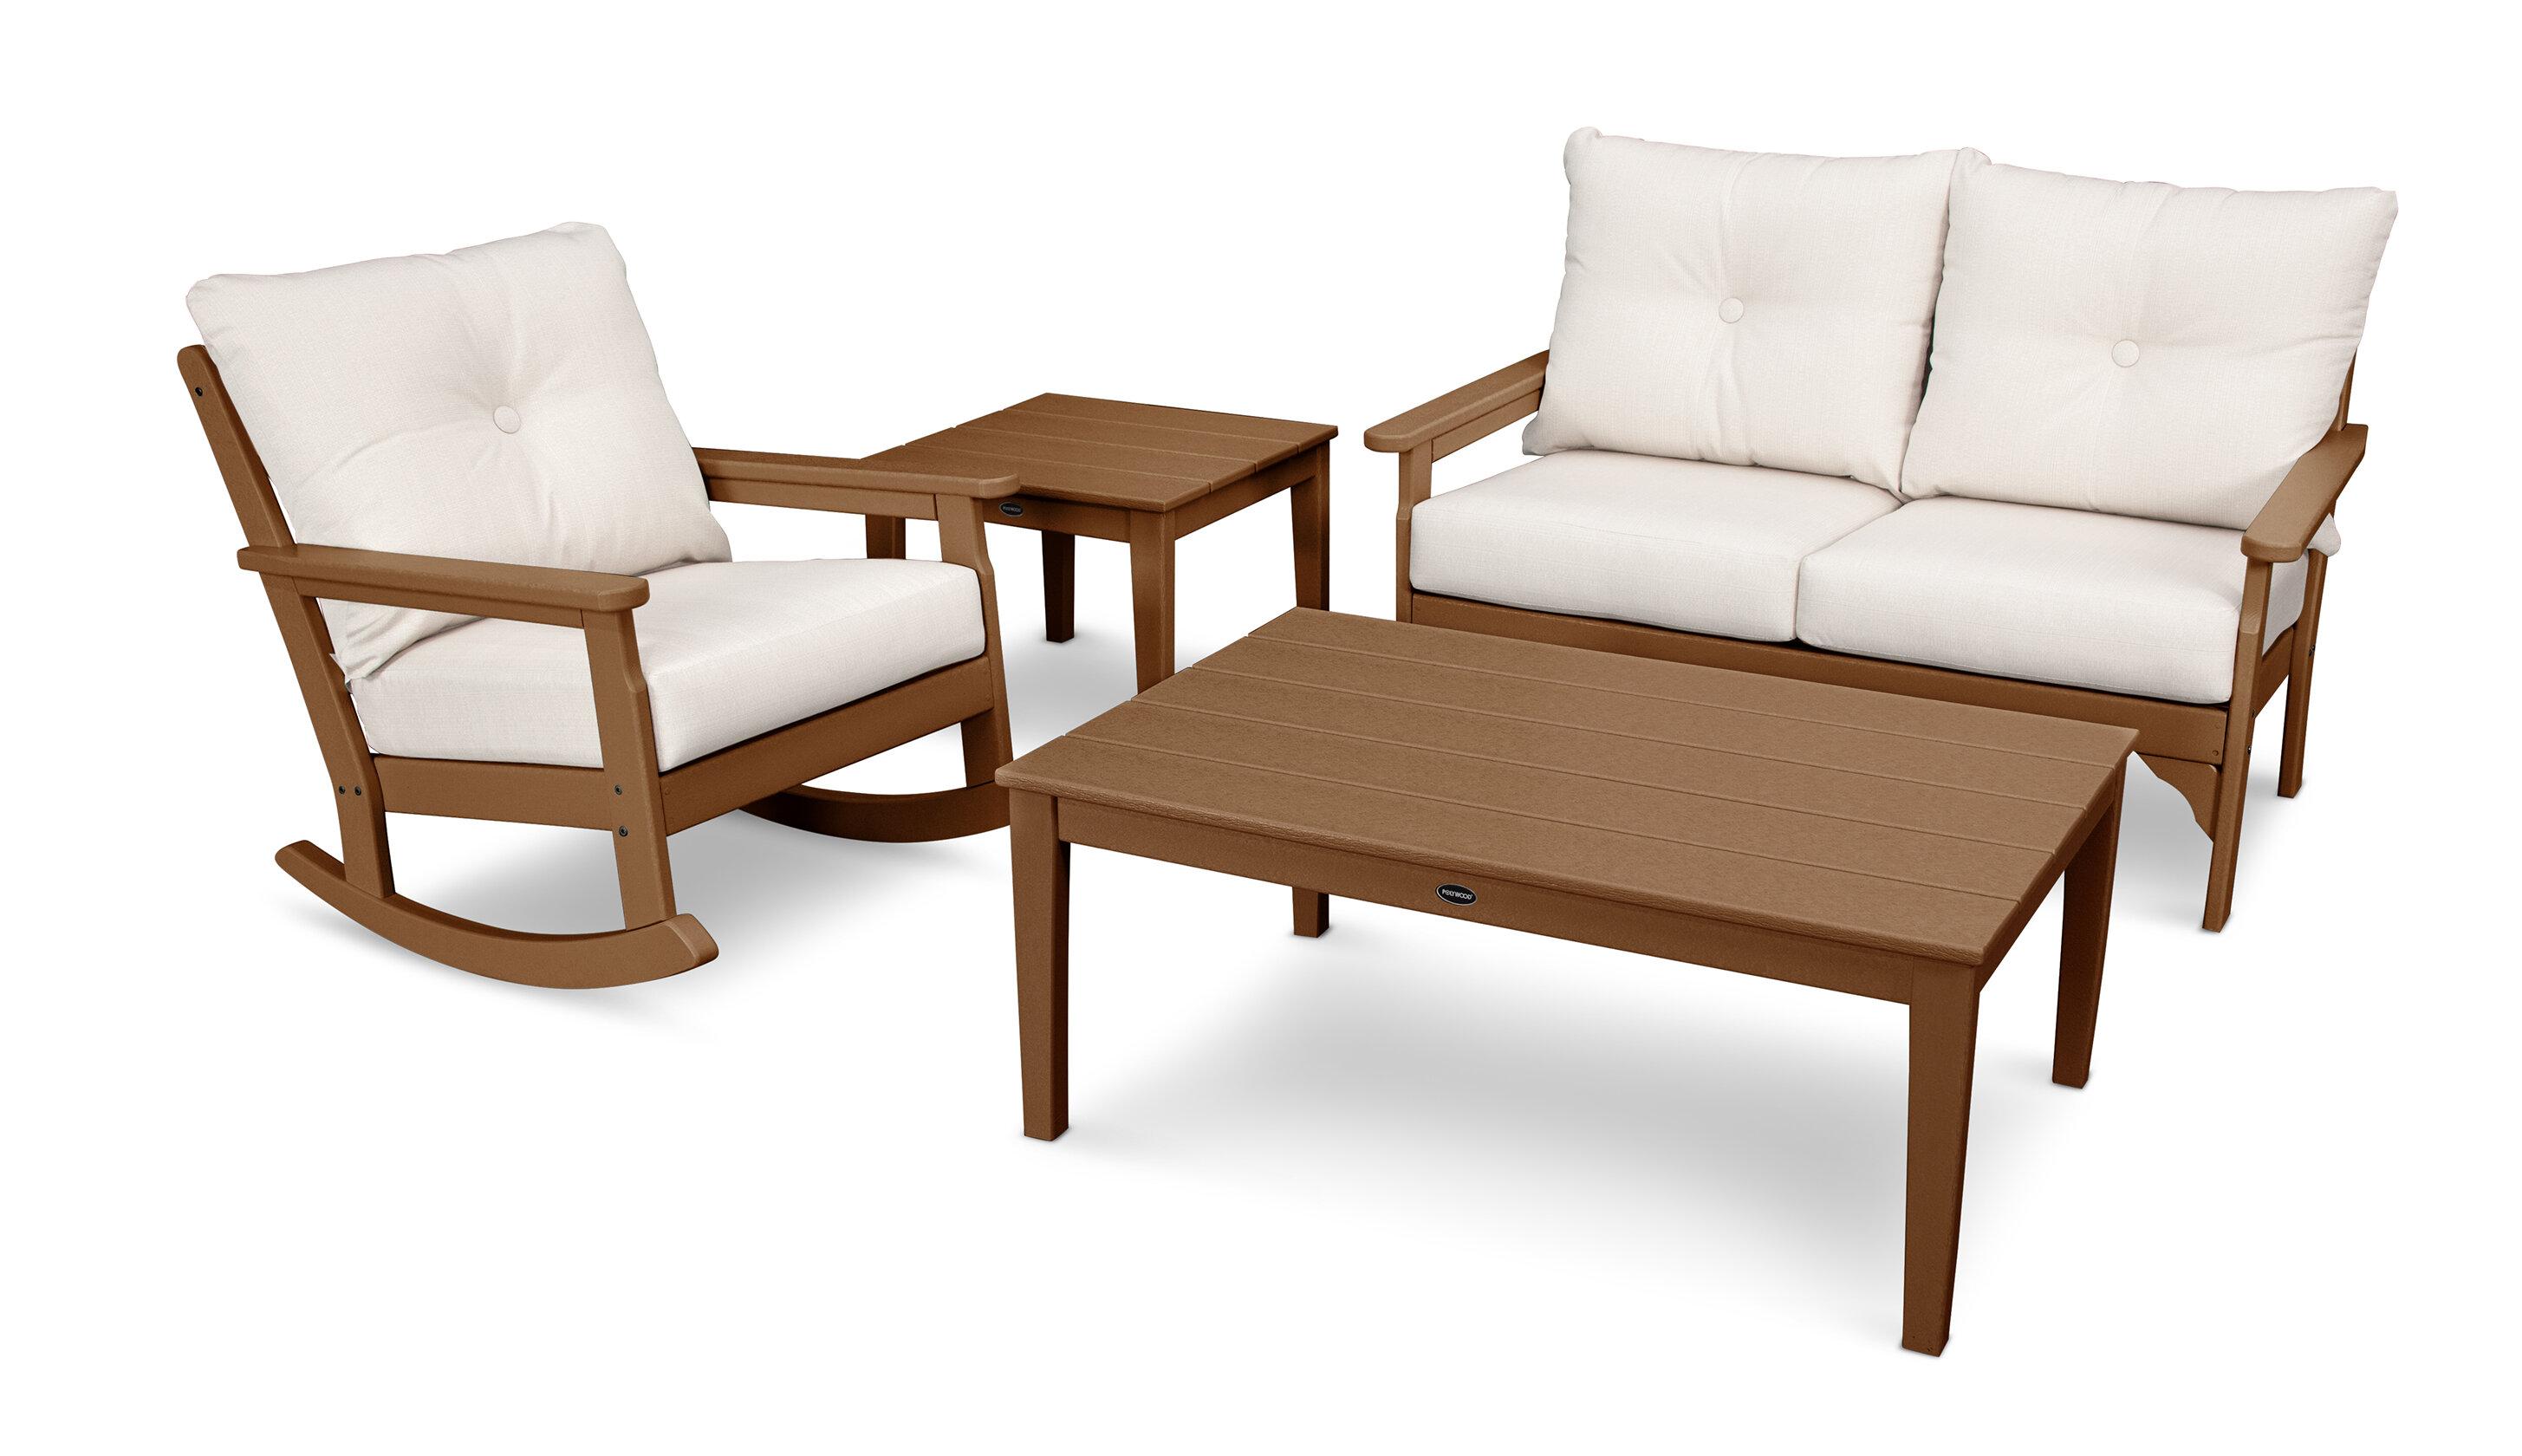 Polywood Vineyard Deep Seating 4 Piece Conversation Set With Cushions Wayfair